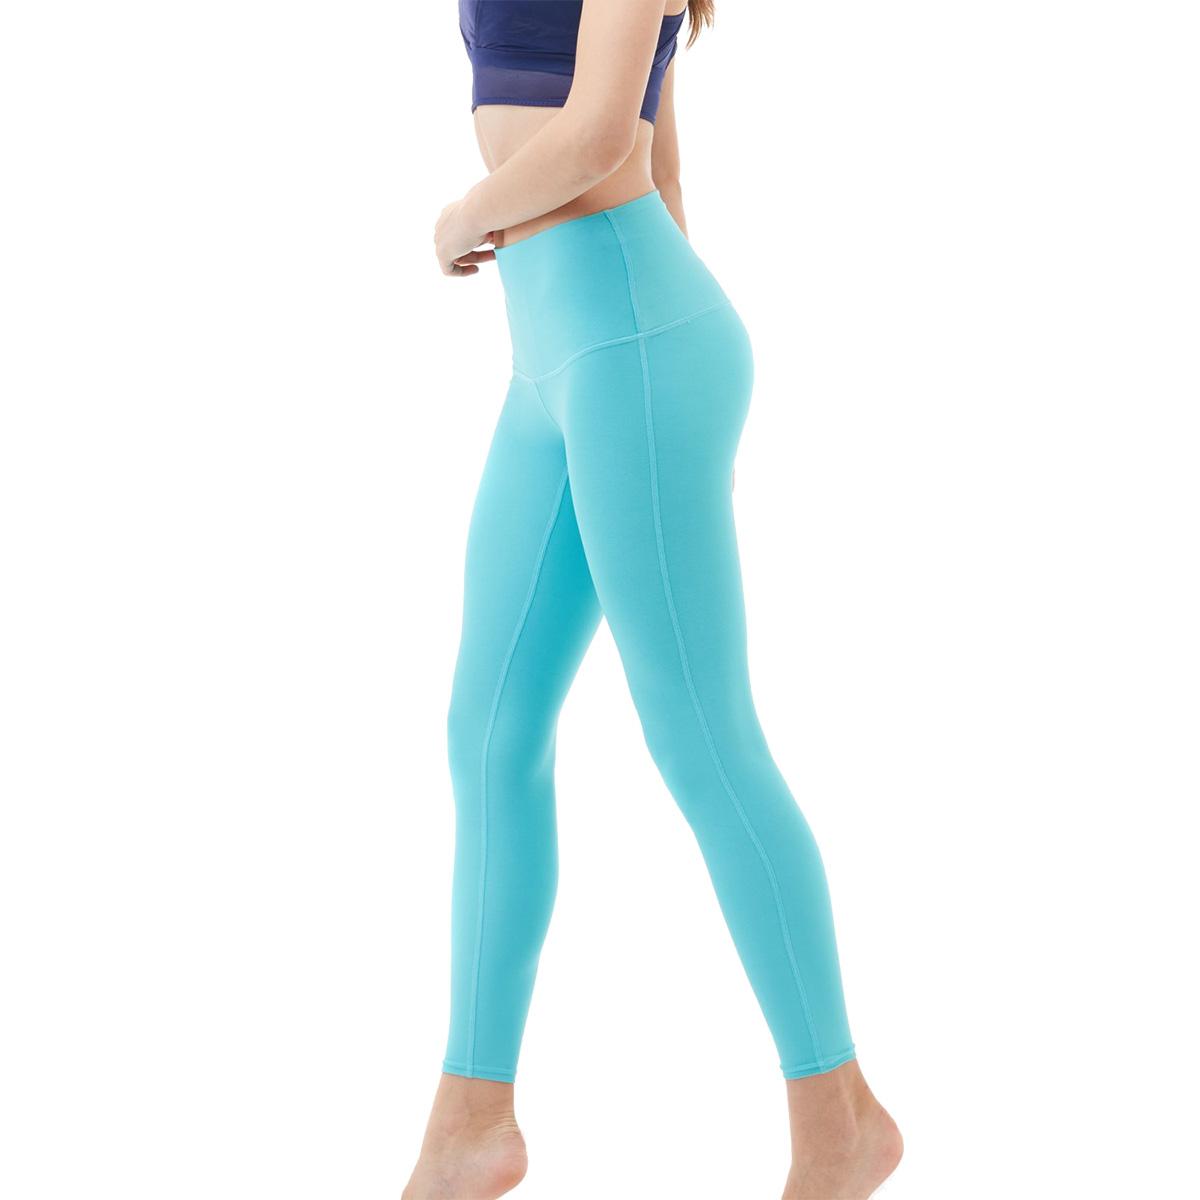 thumbnail 7 - TSLA Tesla FYP42 Women's High-Waisted Ultra-Stretch Tummy Control Yoga Pants